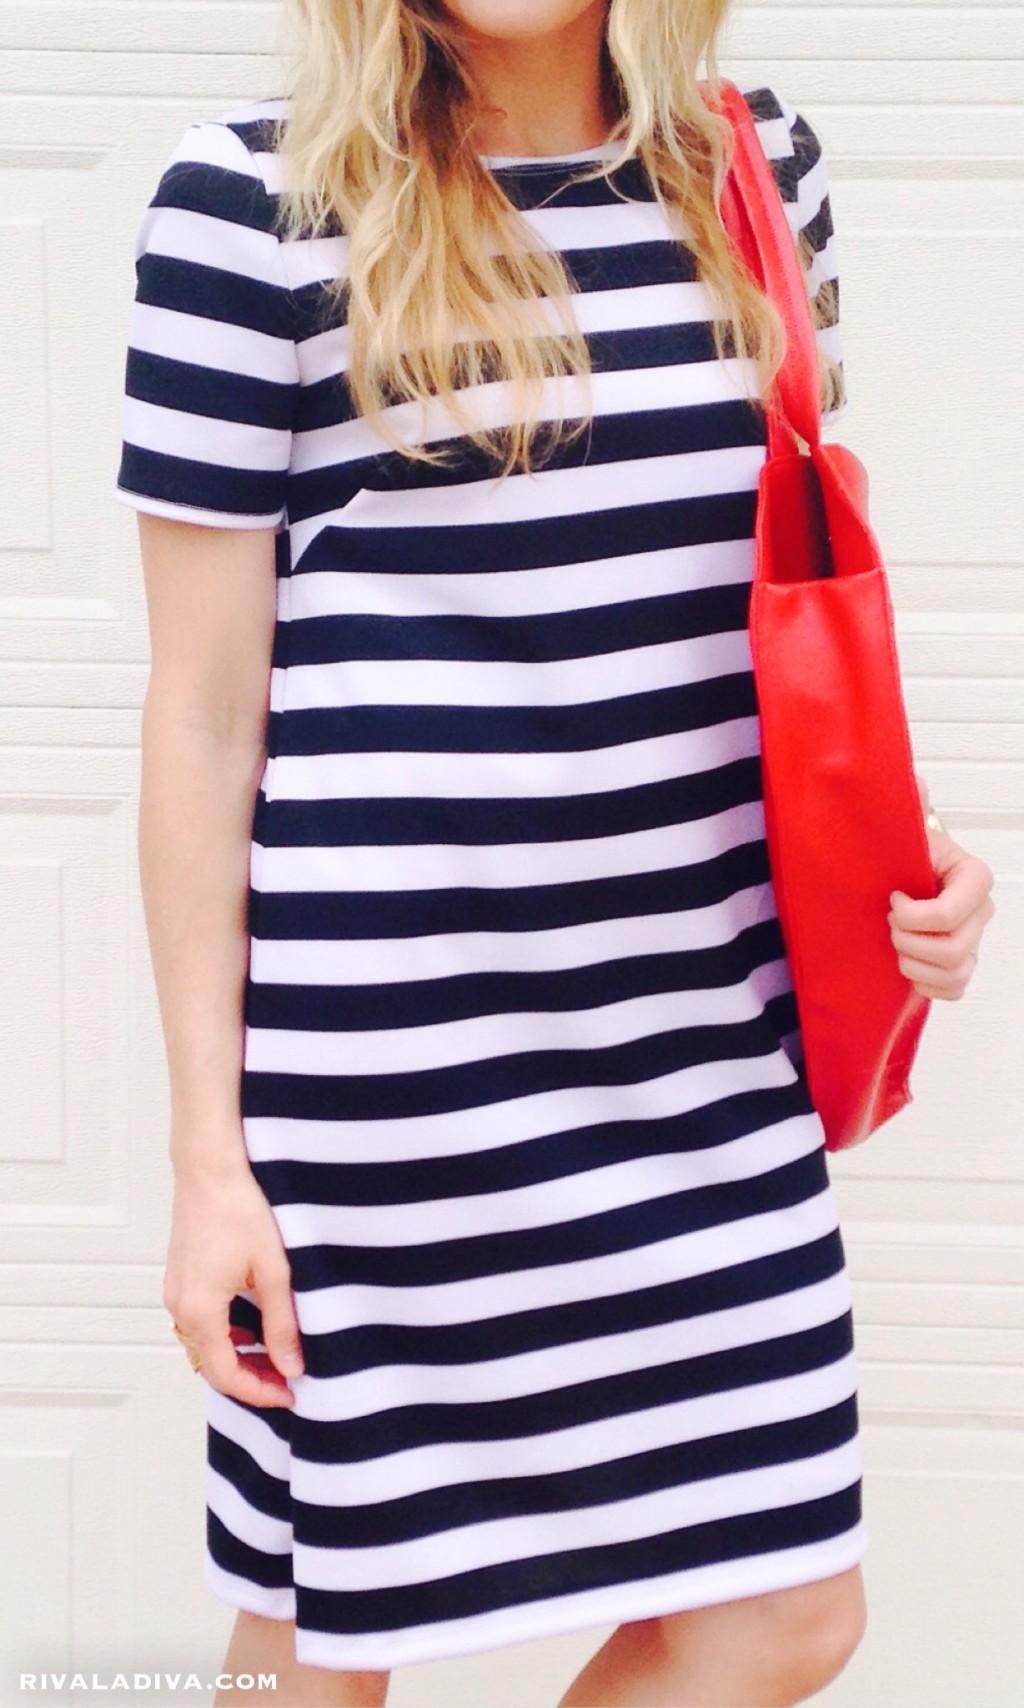 DIY Kate Spade Inspired Stripe Dress